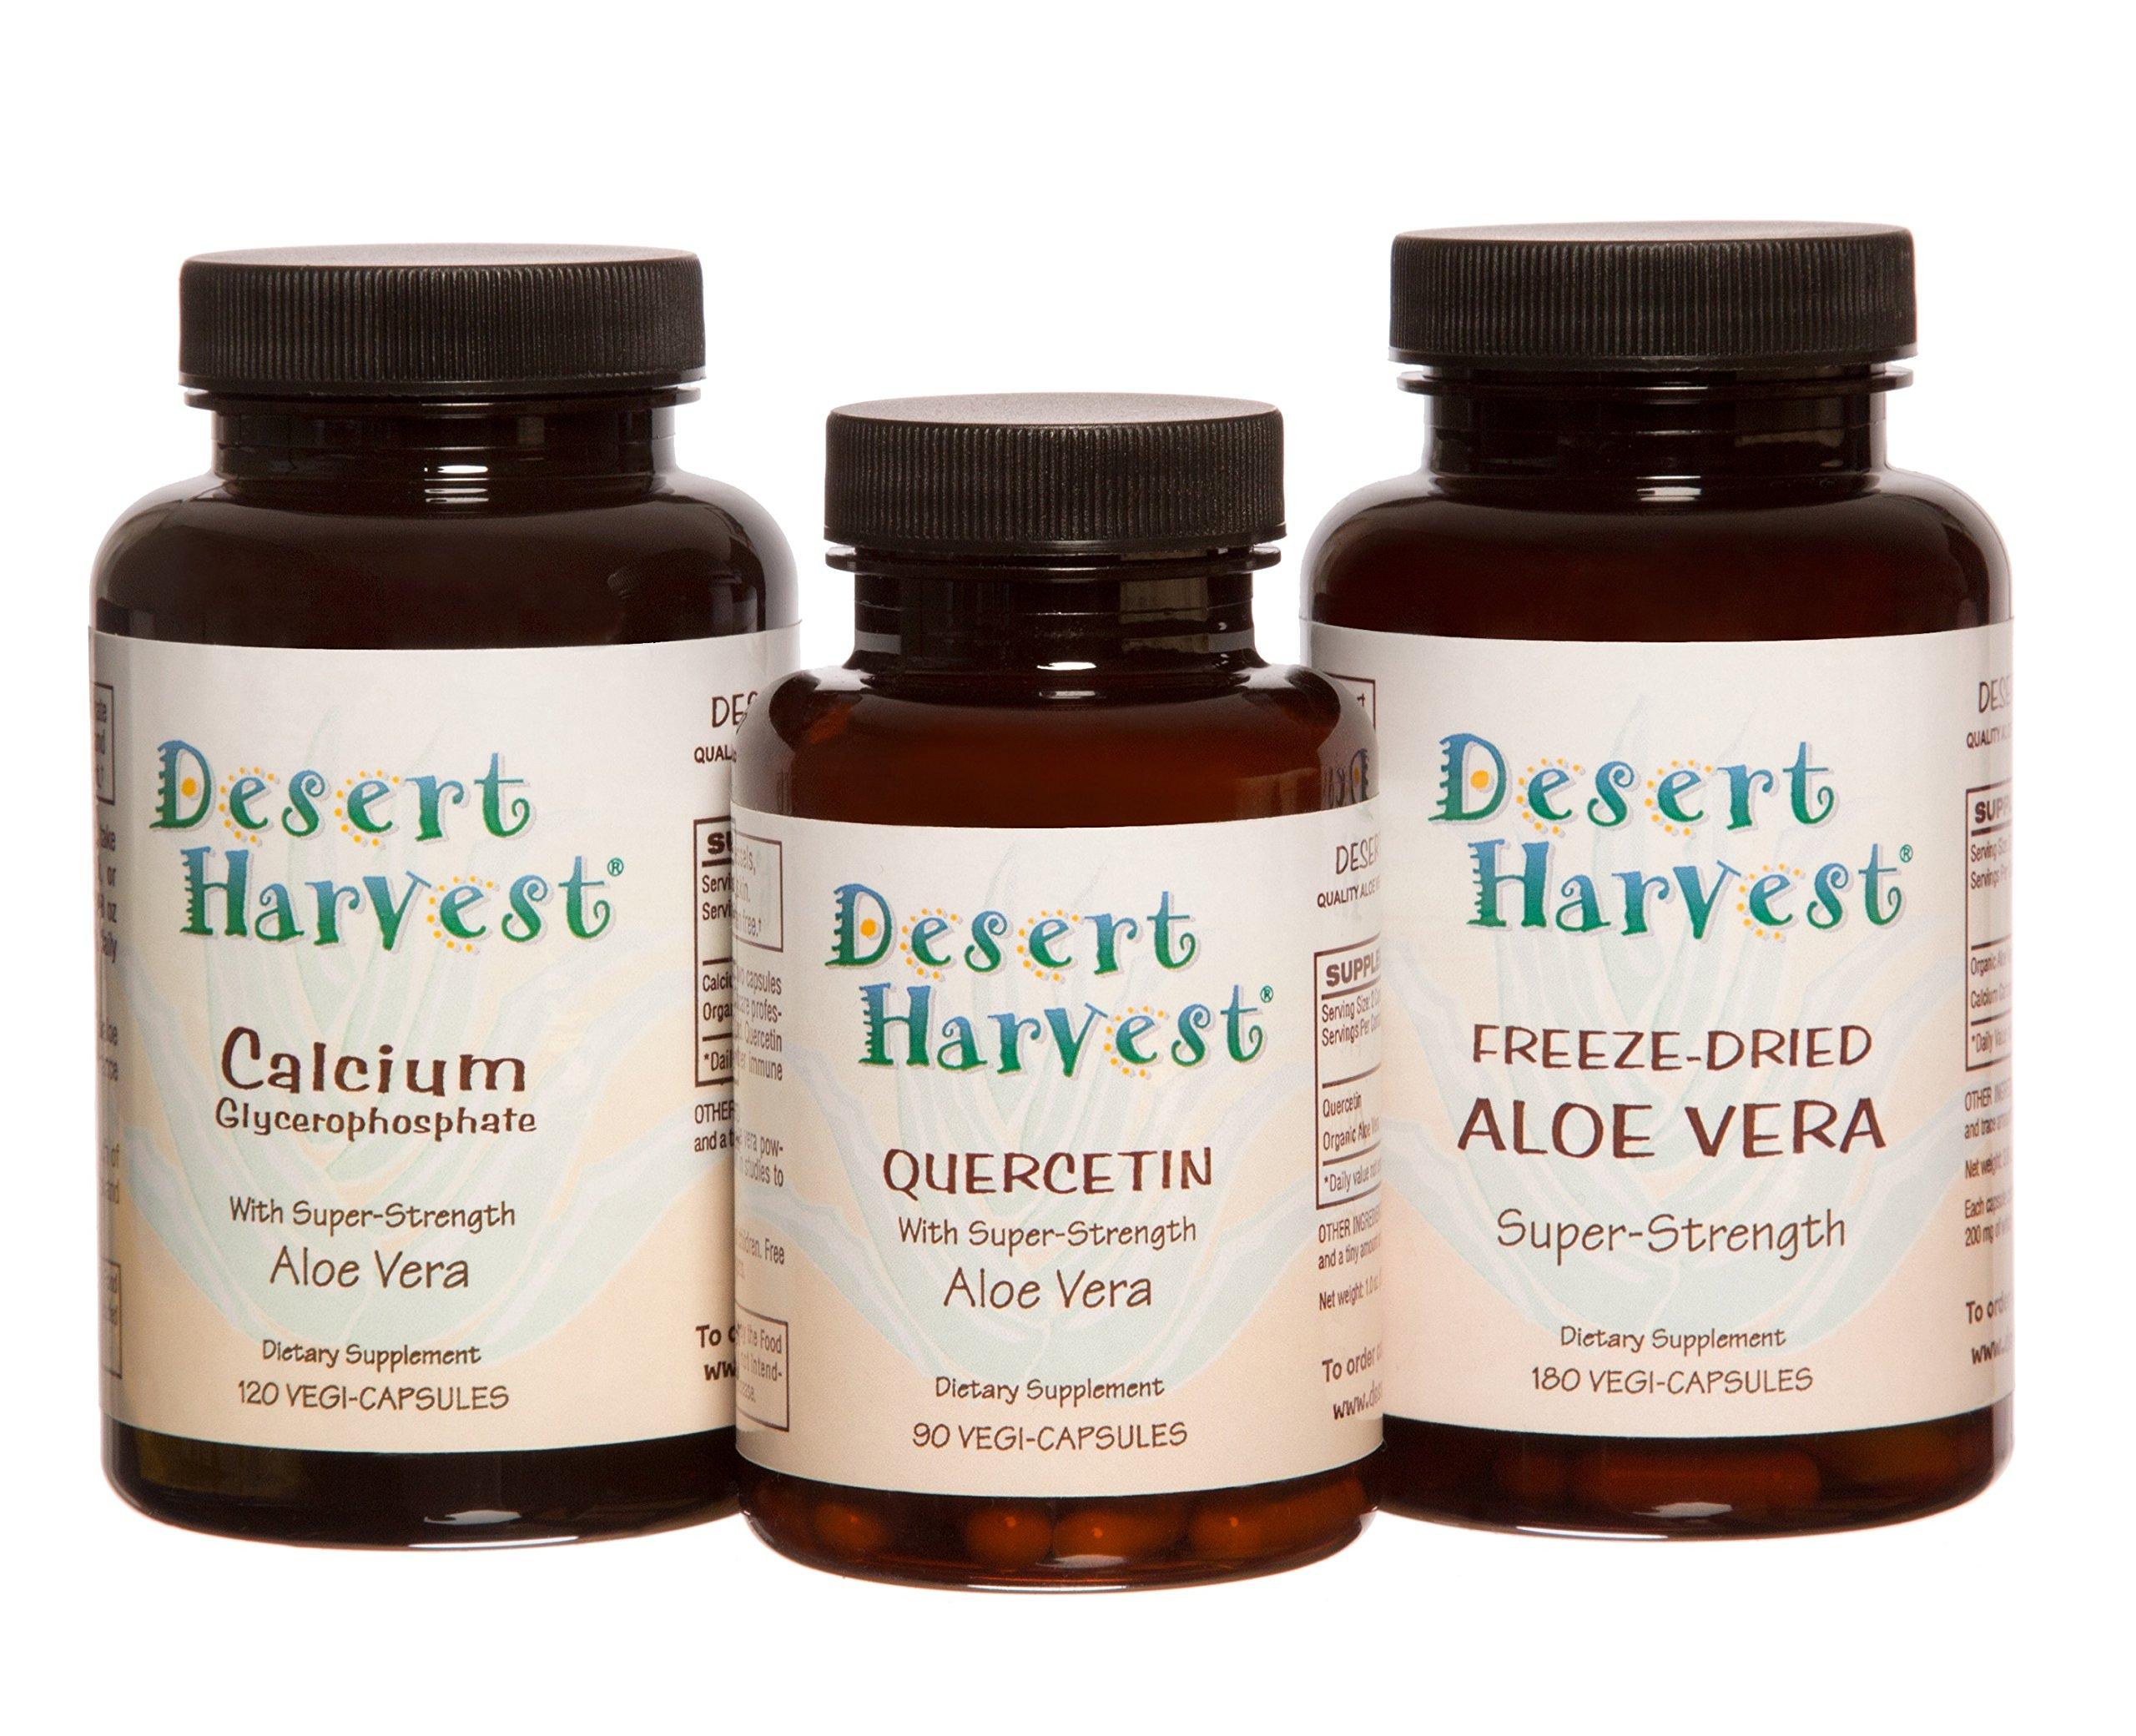 Interstitial Cystitis Starter Kit – Ideal Starter Supplements for IC/BPS. Super-Strength Aloe Vera Capsules + Calcium Glycerophosphate + Quercetin. Bladder Pain Relief, antihistamine, Acid Reducer